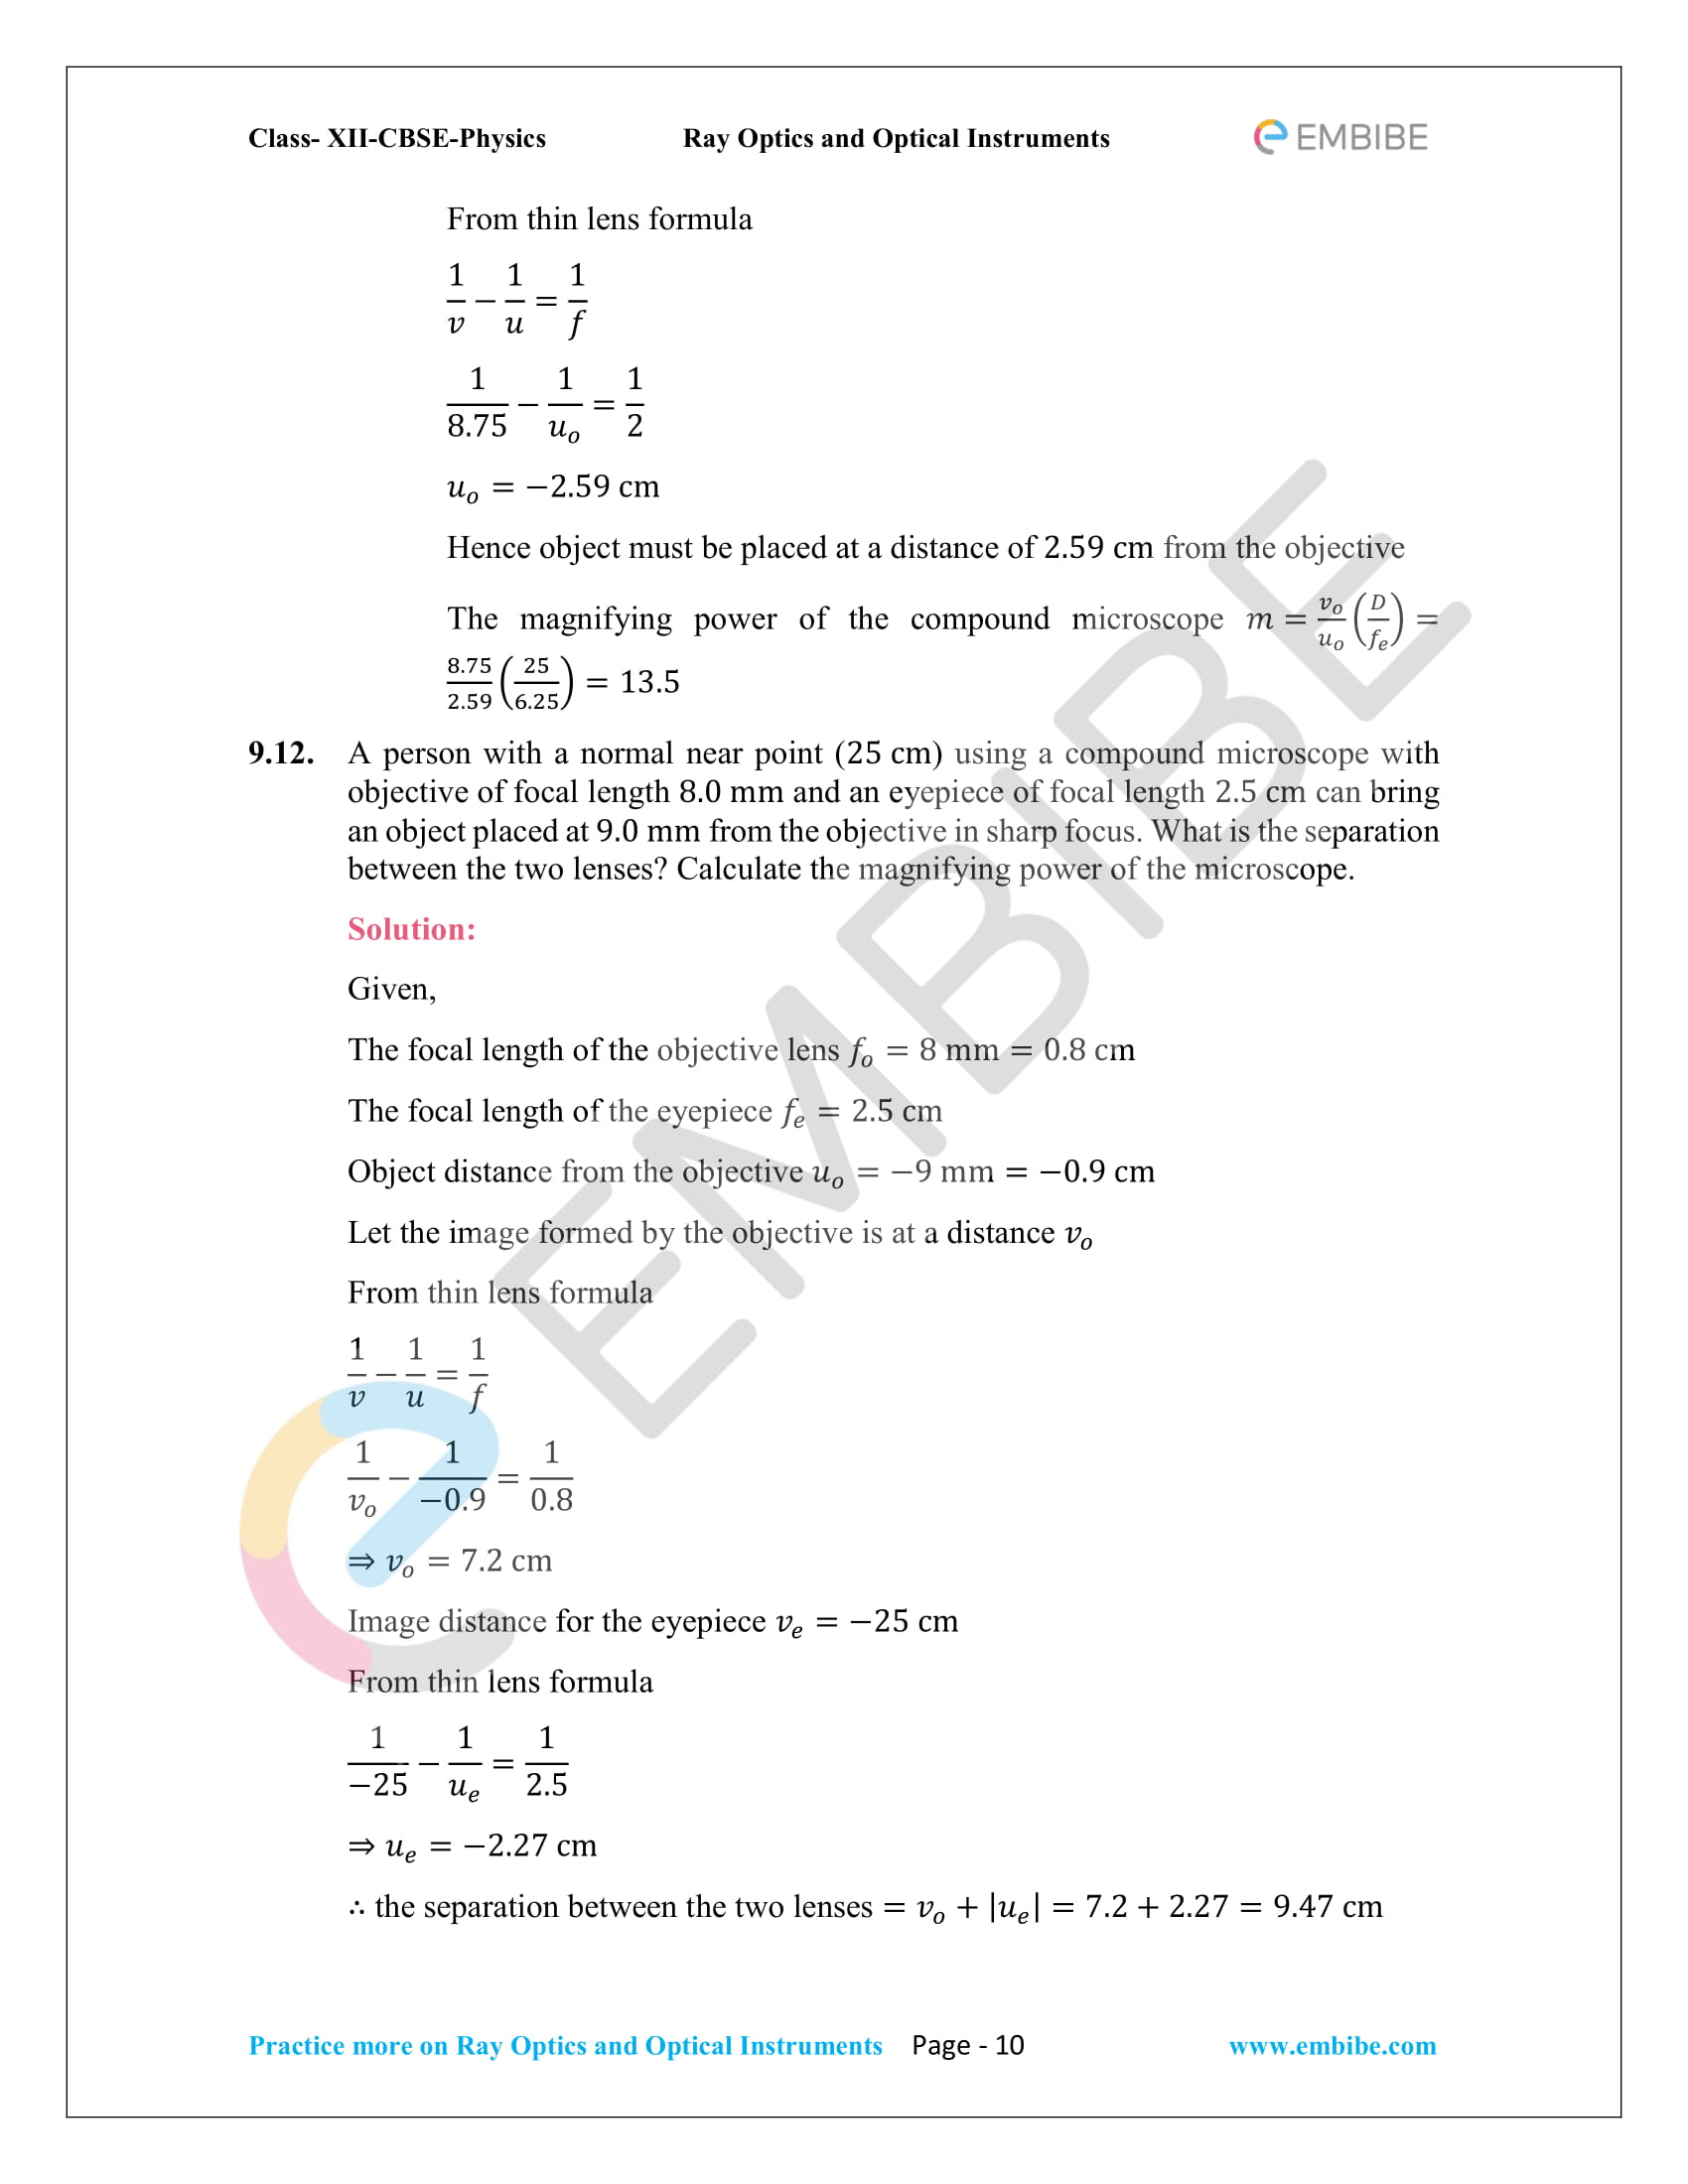 NCERT_Grade 12_Physics_Ch_09_Ray Optics-10